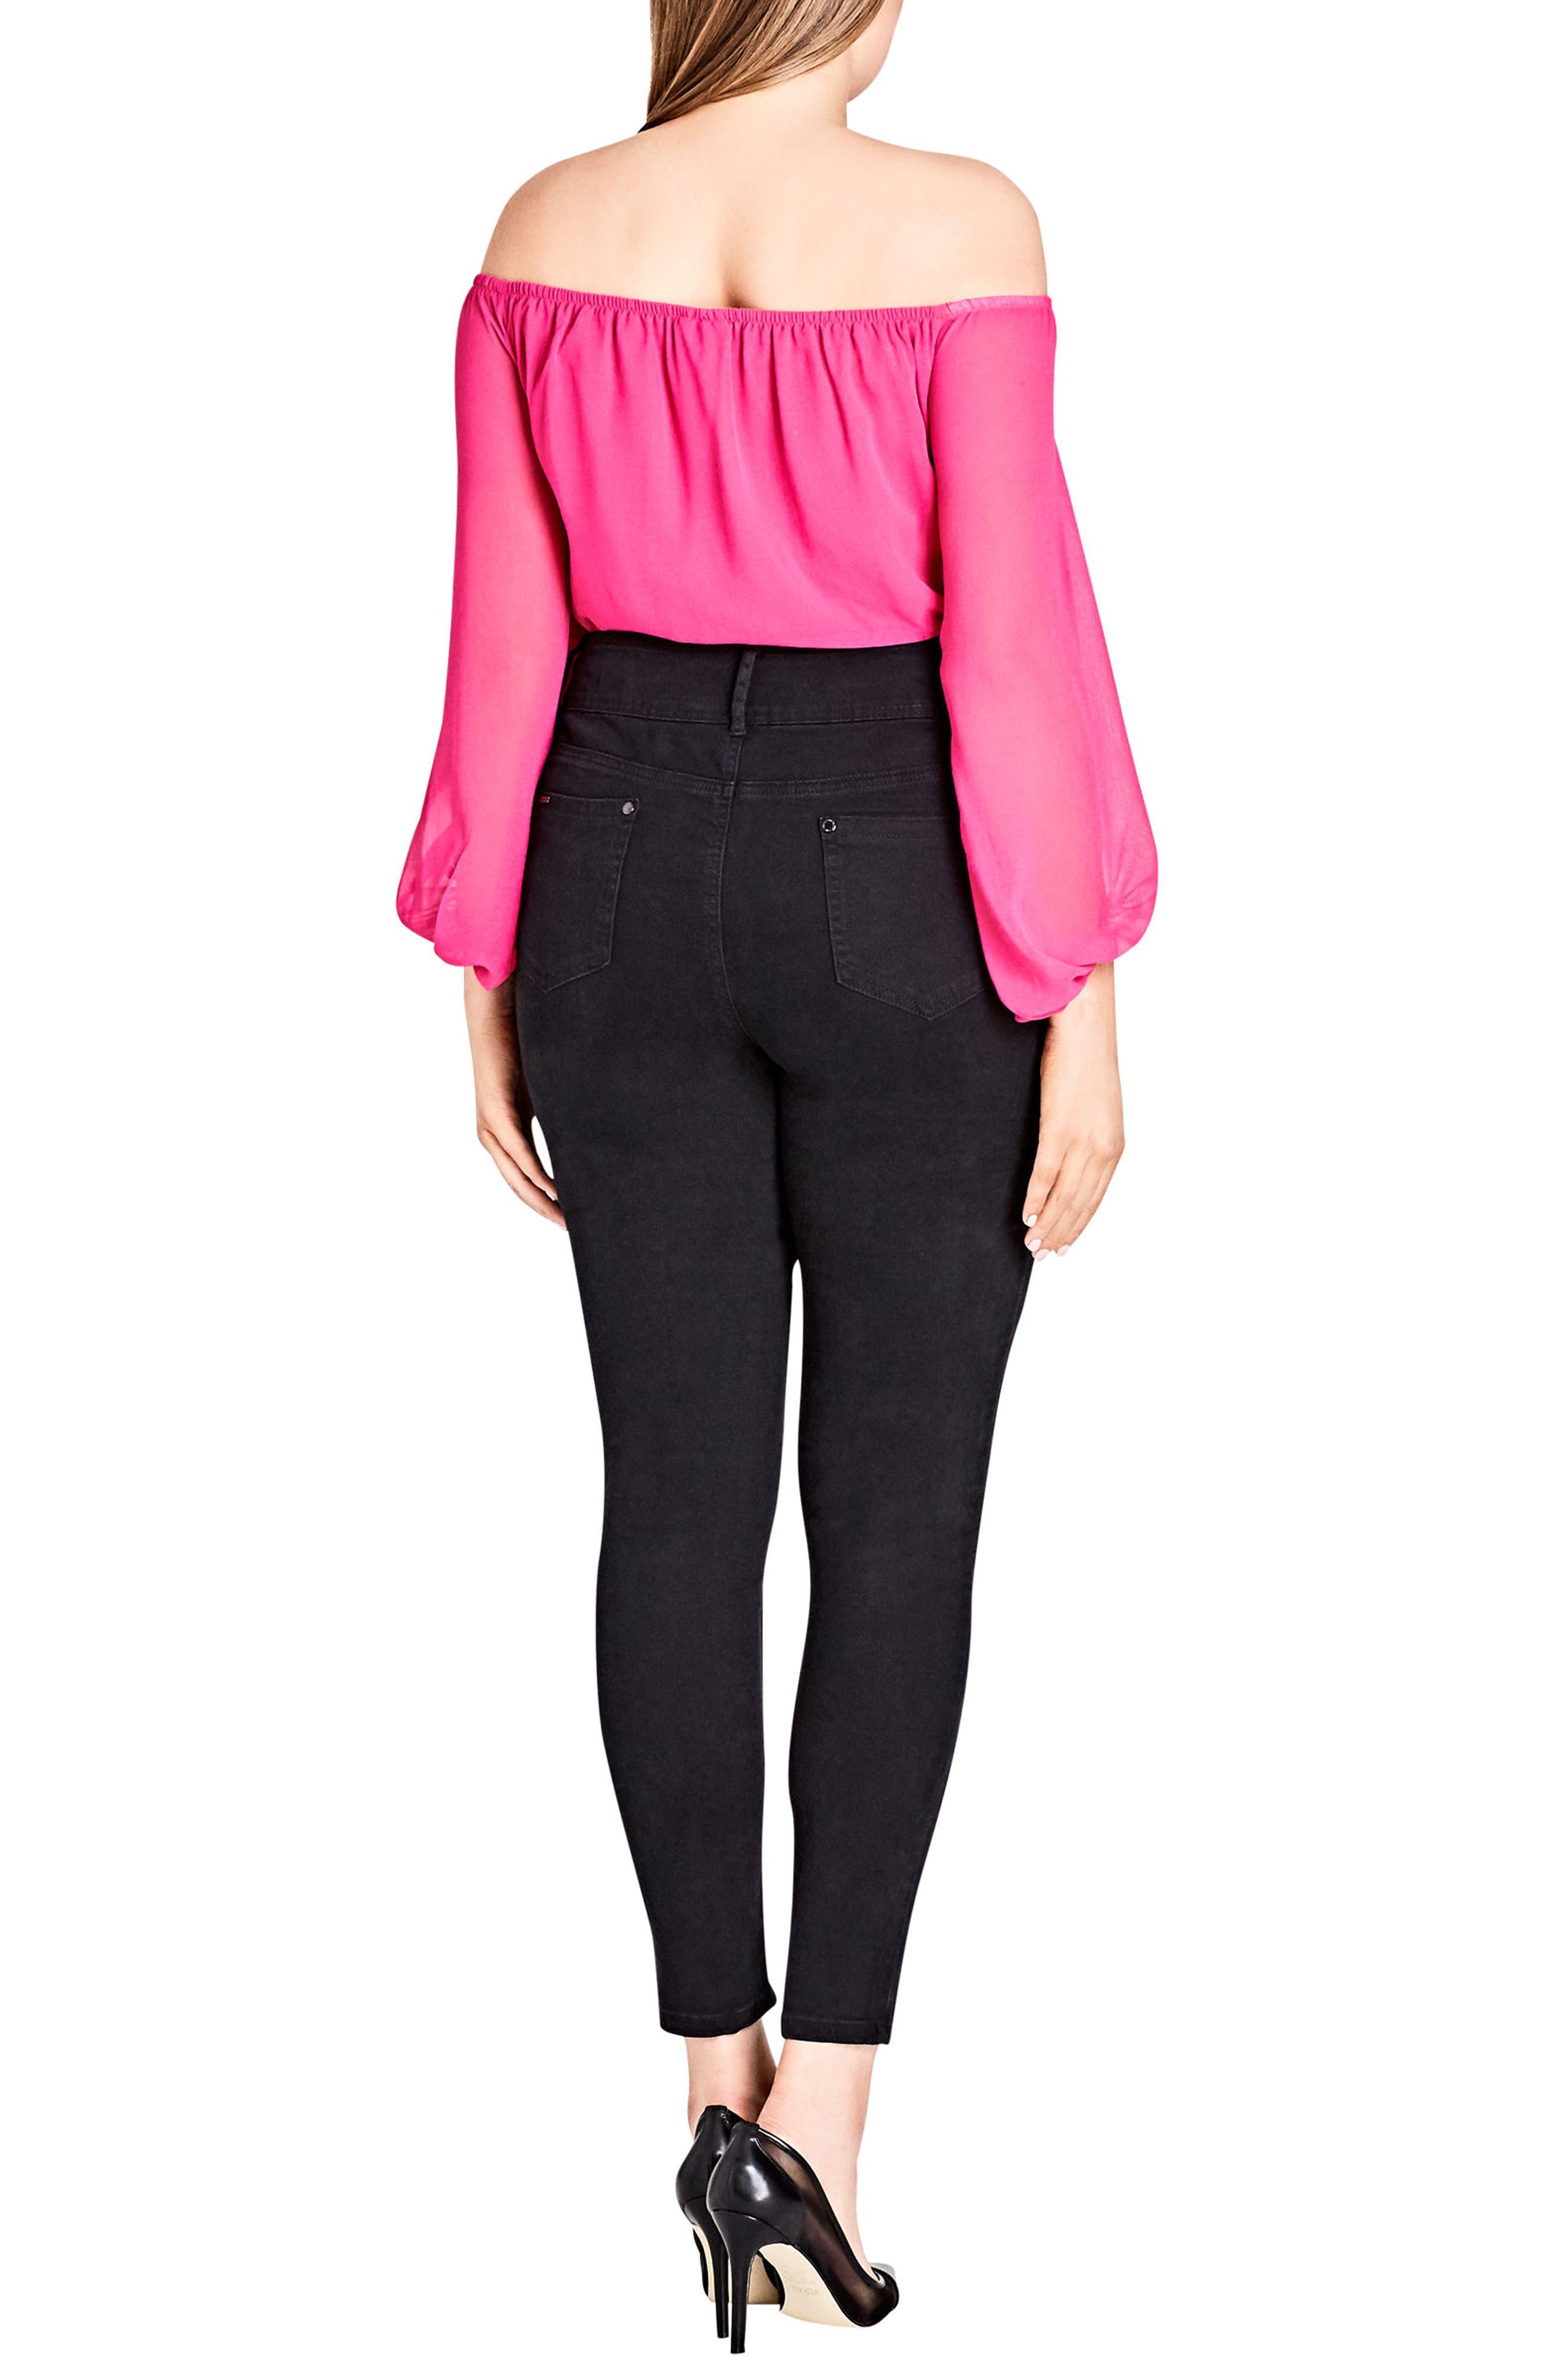 Asha Ripped Skinny Jeans,                             Alternate thumbnail 3, color,                             001